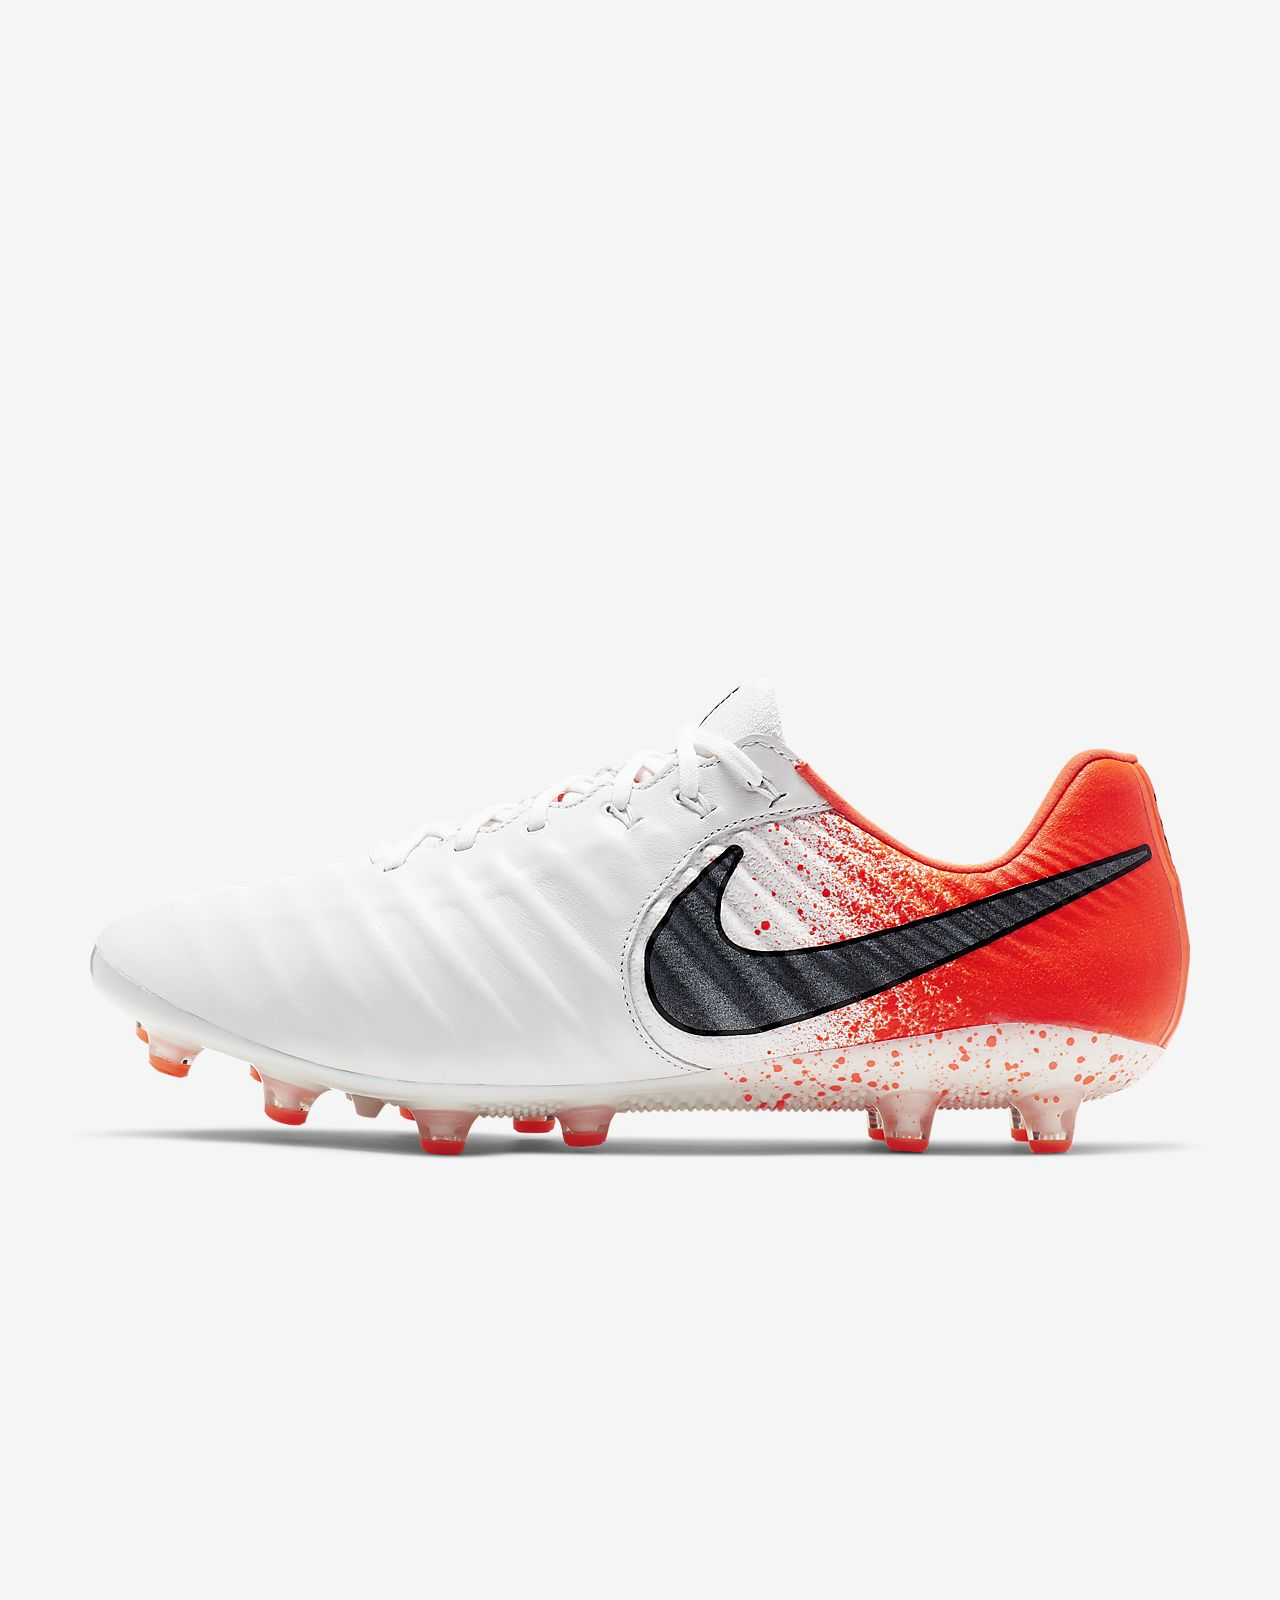 11ca359d14 ... Scarpa da calcio per erba artificiale Nike Legend VII Elite AG-PRO